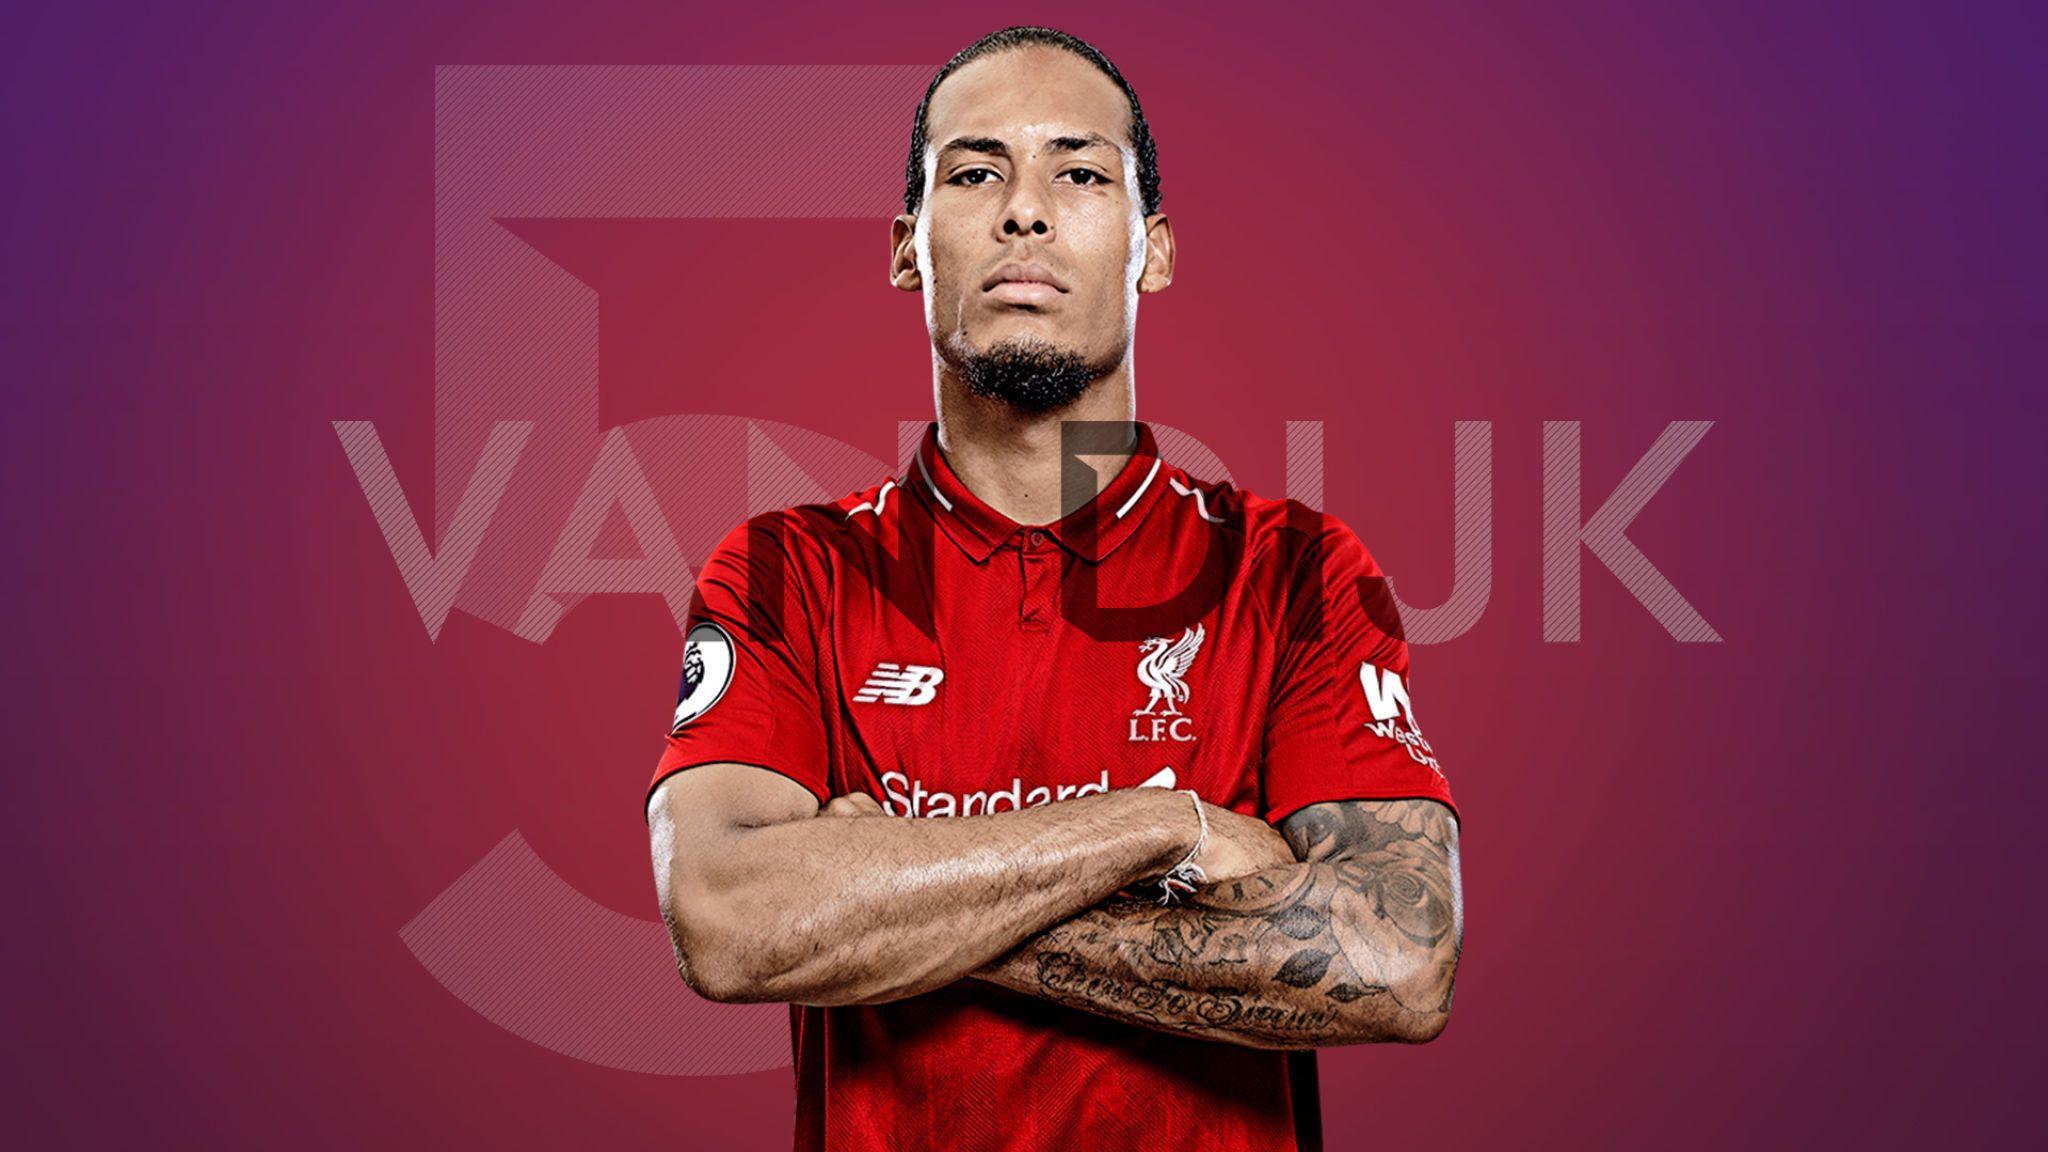 Rhian Brewster Wallpaper: Virgil Van Dijk HD Desktop Wallpapers At Liverpool FC